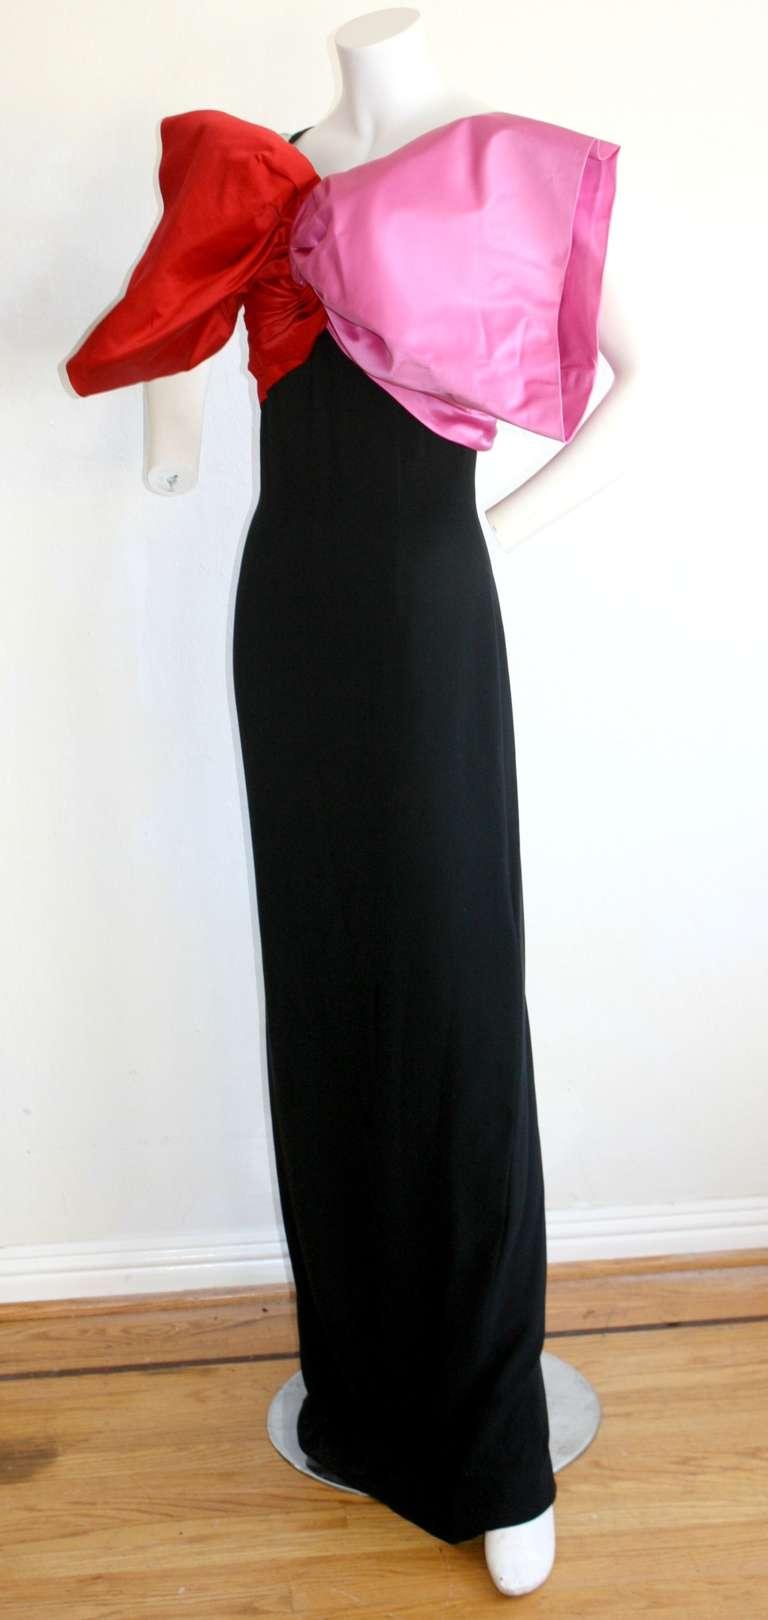 Stunning Vintage Bill Blass Gown Avant Garde Pink + Red Black Bow Dress / Gown 6